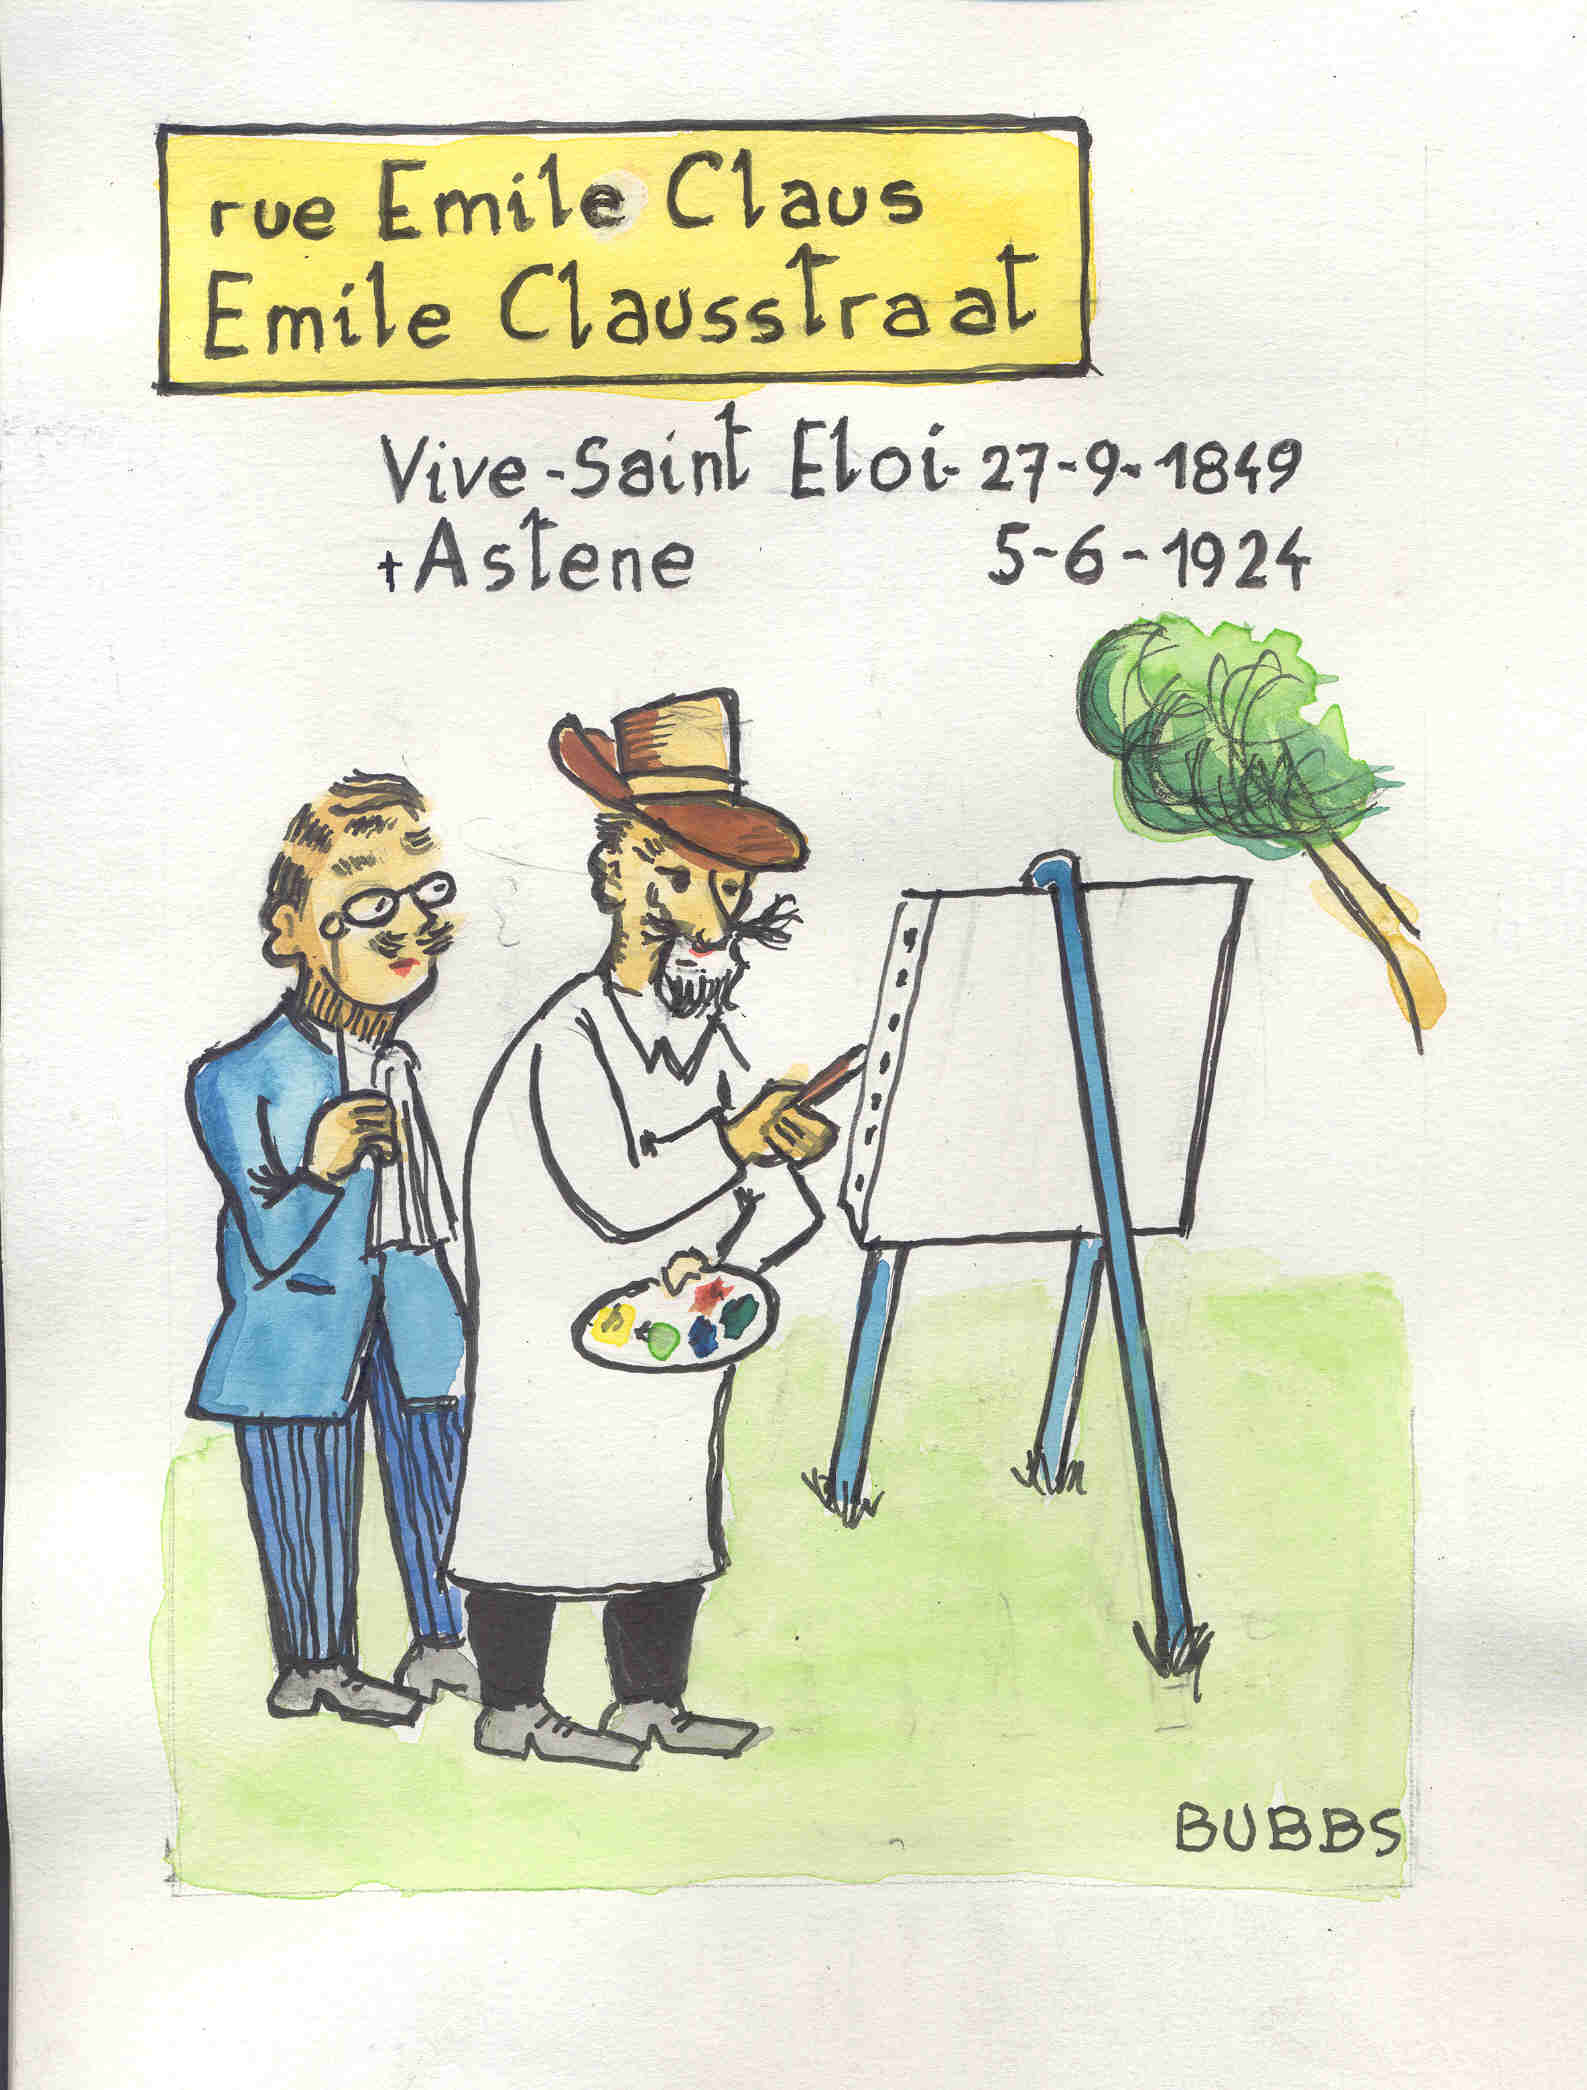 Rue Emile Claus. Bubbs.